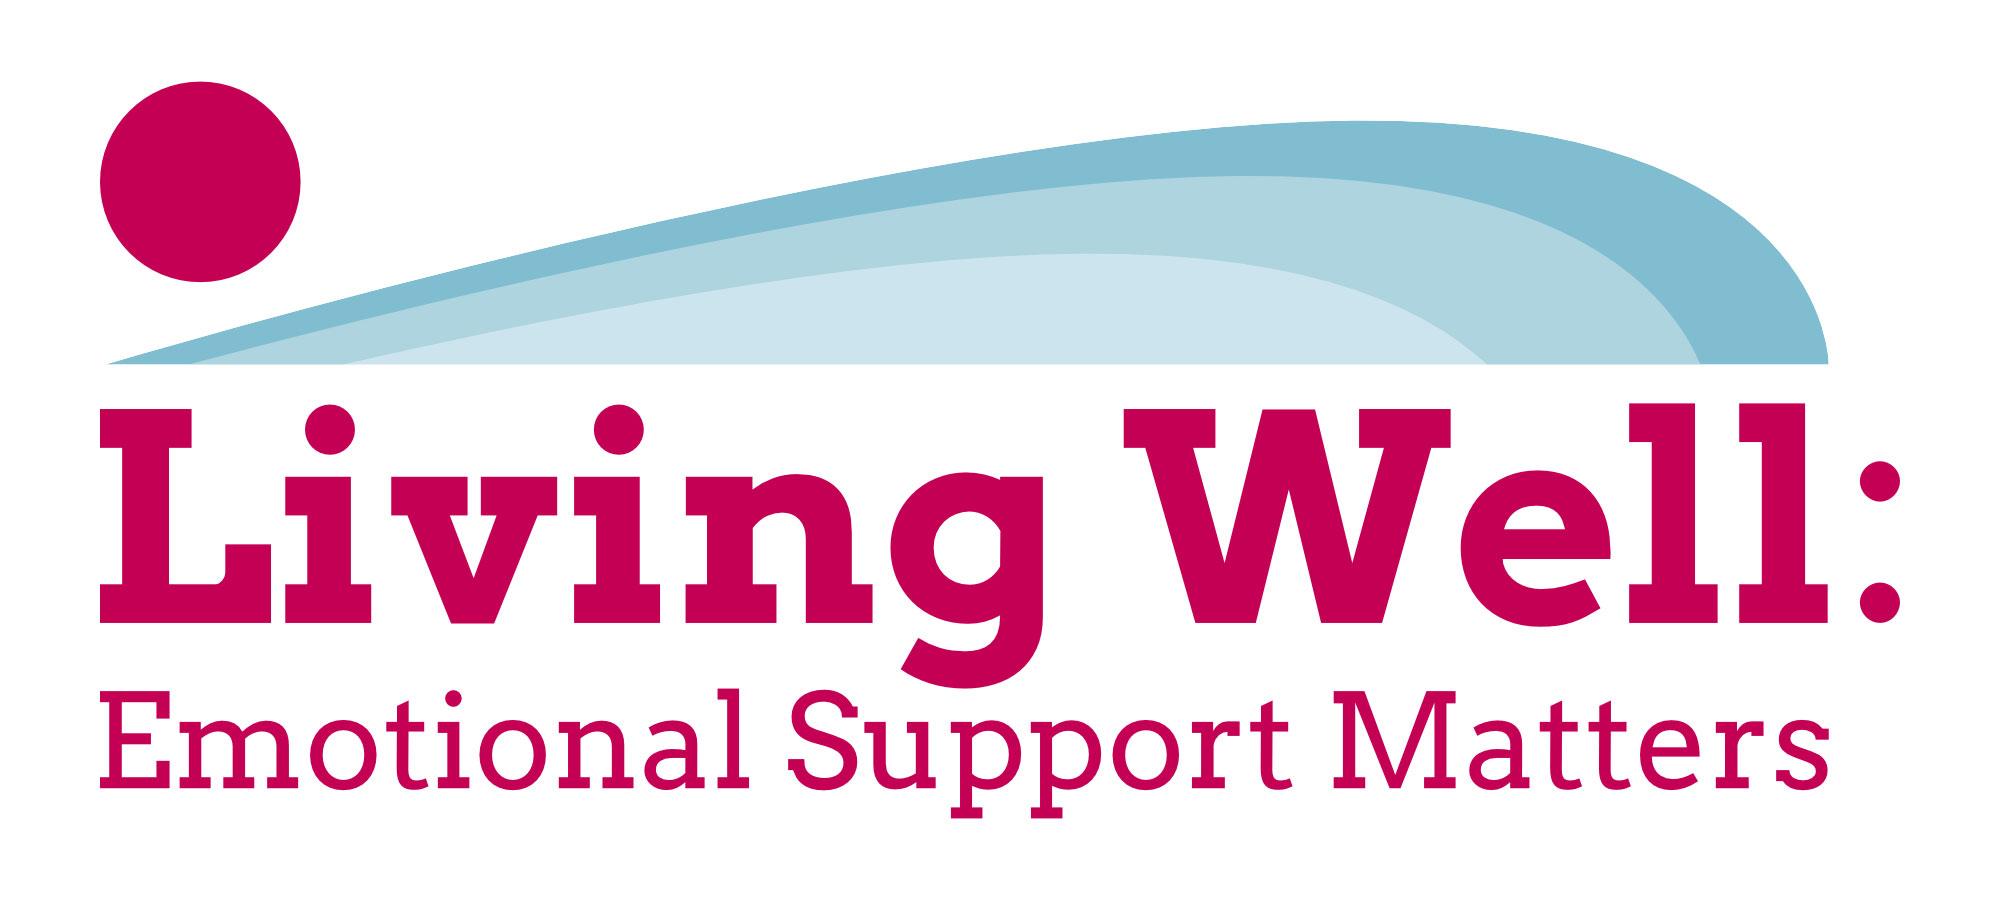 Living Well: Emotional Support Matters logo